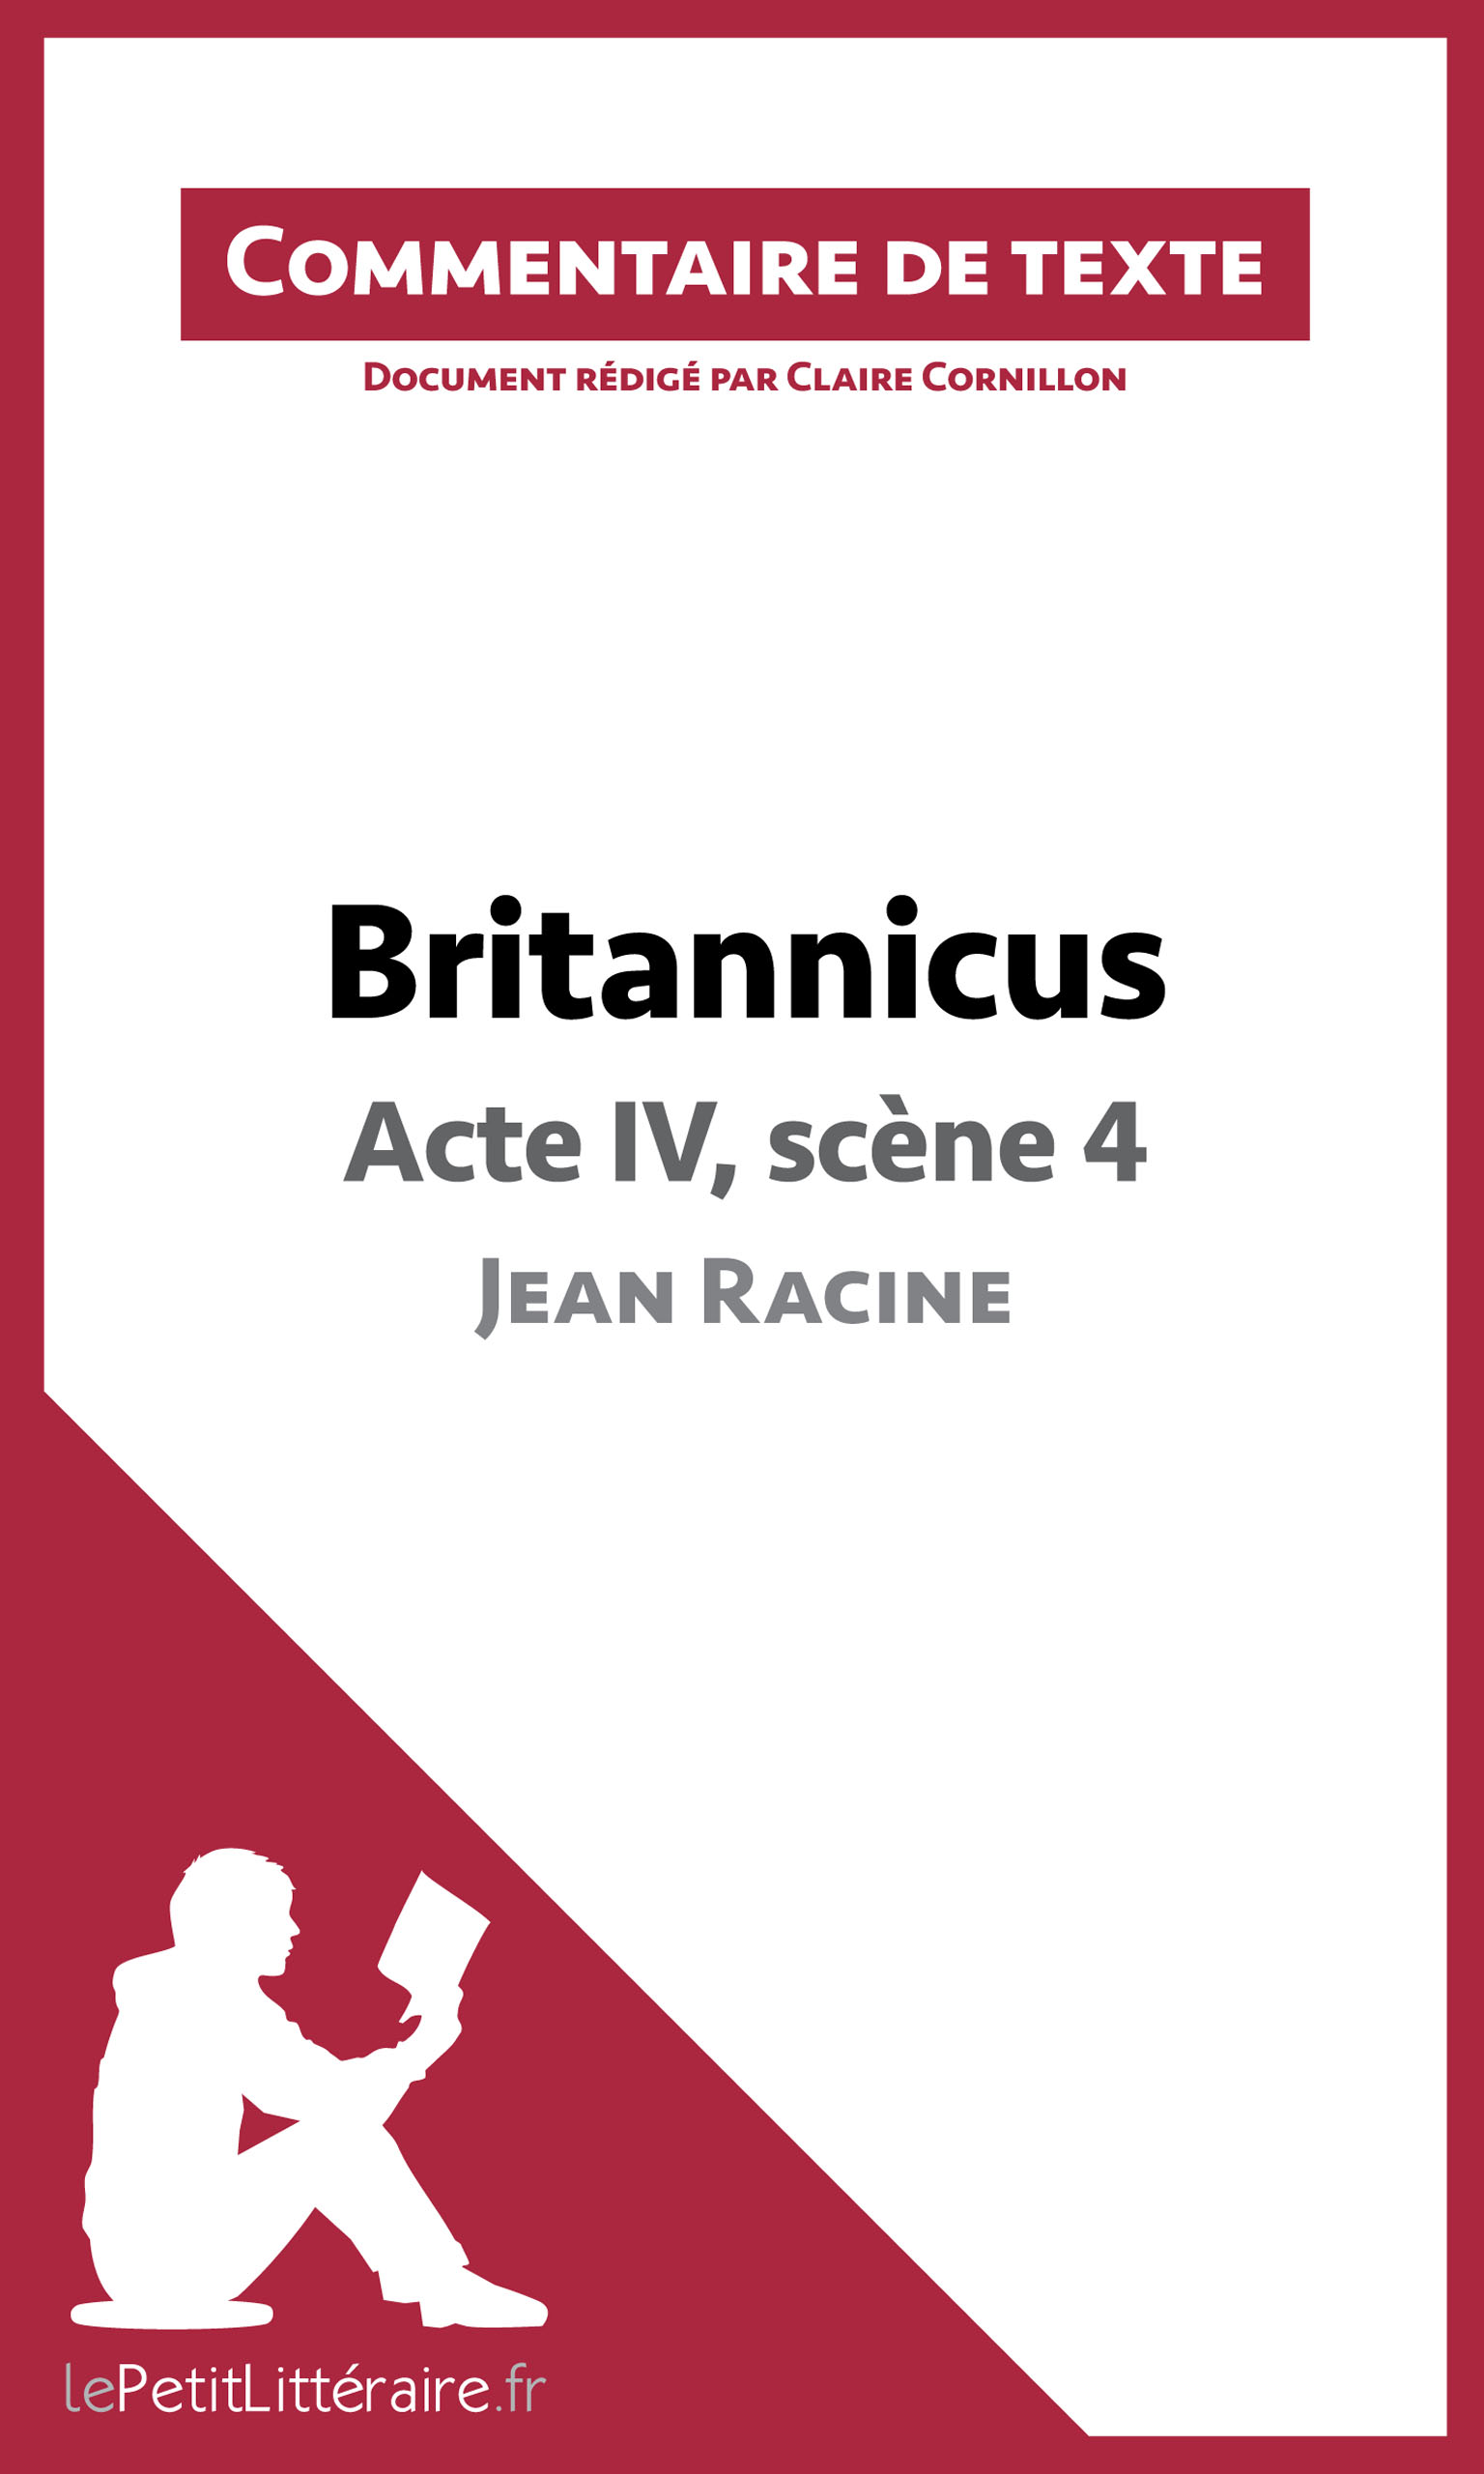 La scène 4 de l'acte IV